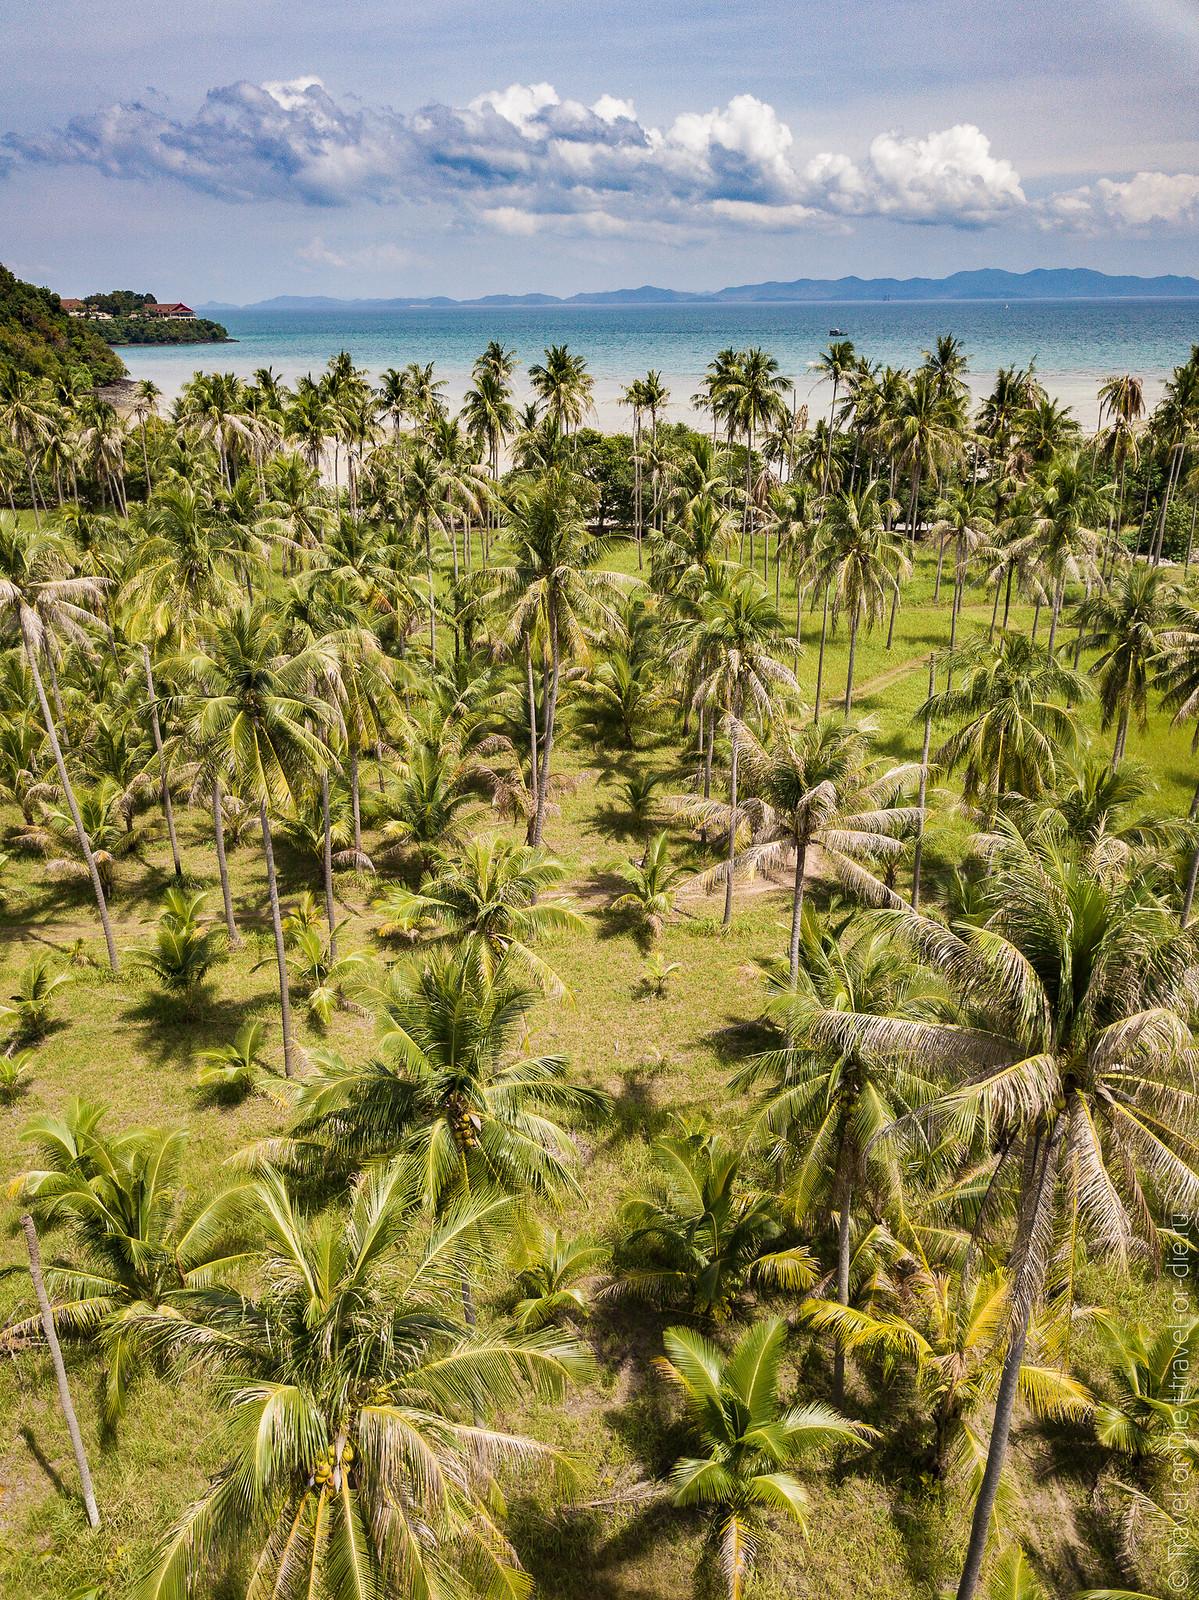 Rang-Yai-Island-Phuket-mavic-0972